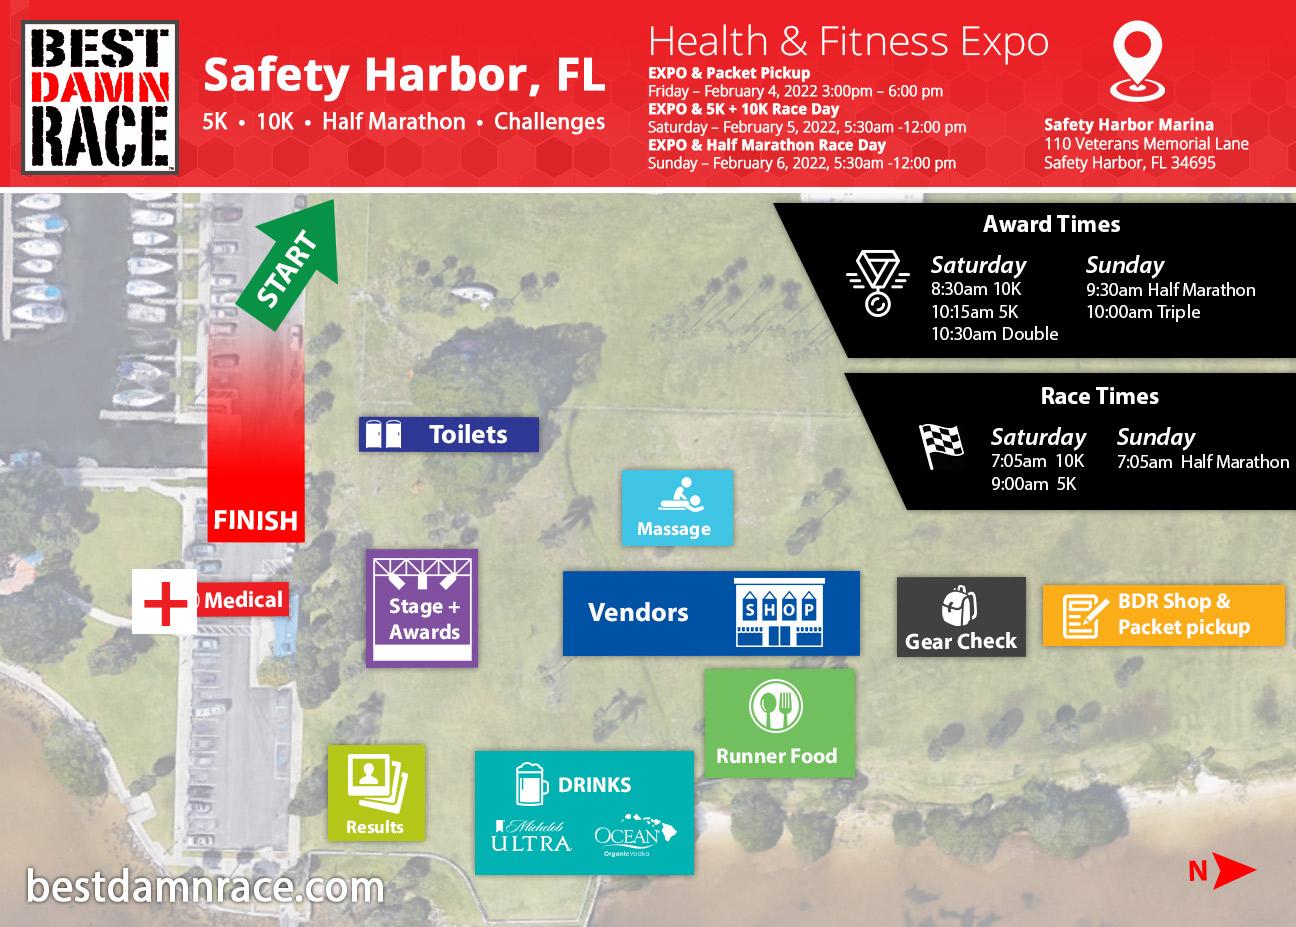 2022 Expo & Venue - Safety Harbor, FL Best Damn Race